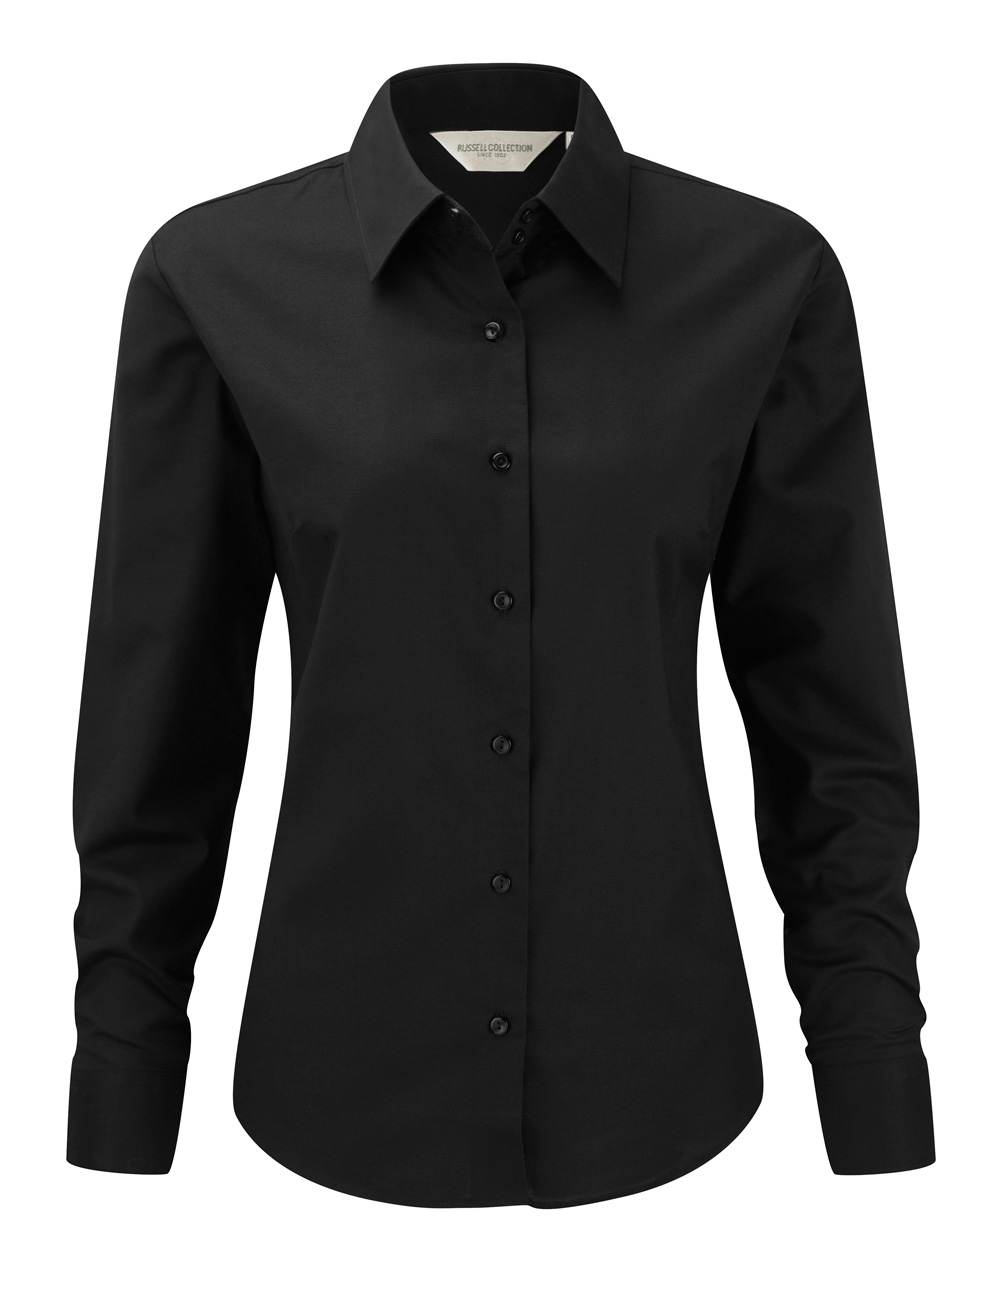 langarm bluse schwarz